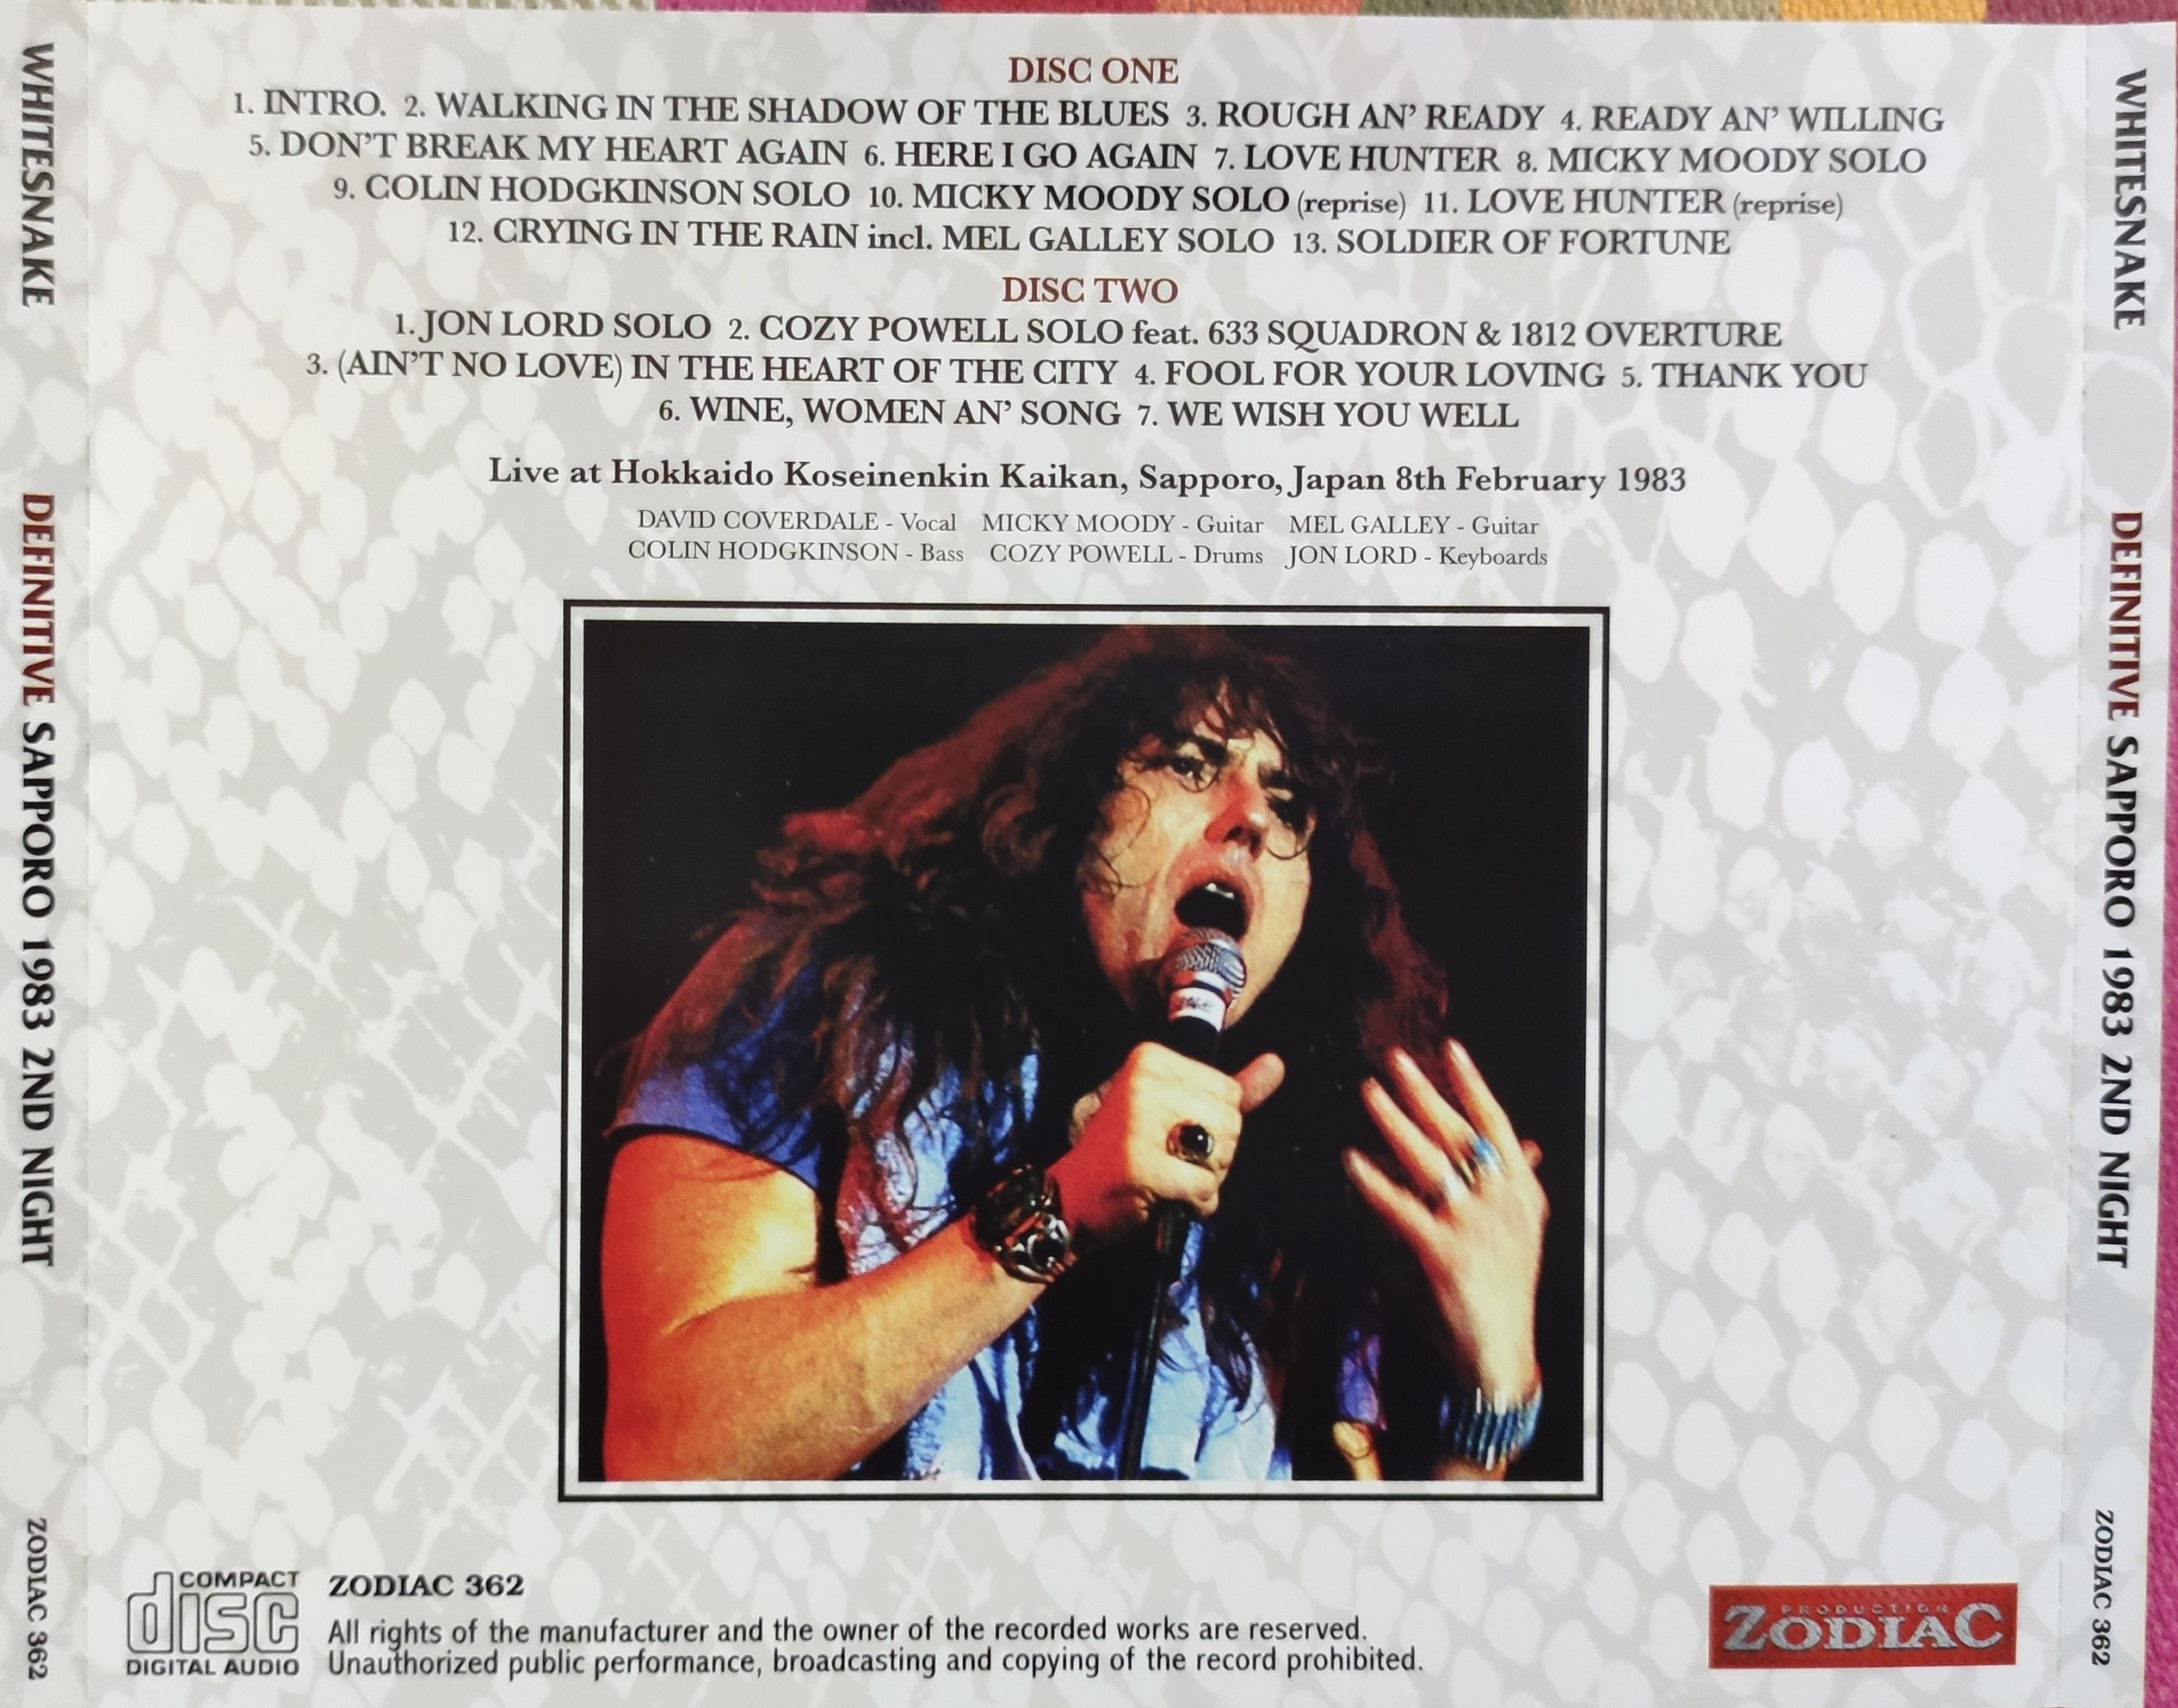 vos bootlegs Whitesnake - Page 3 Img_2254